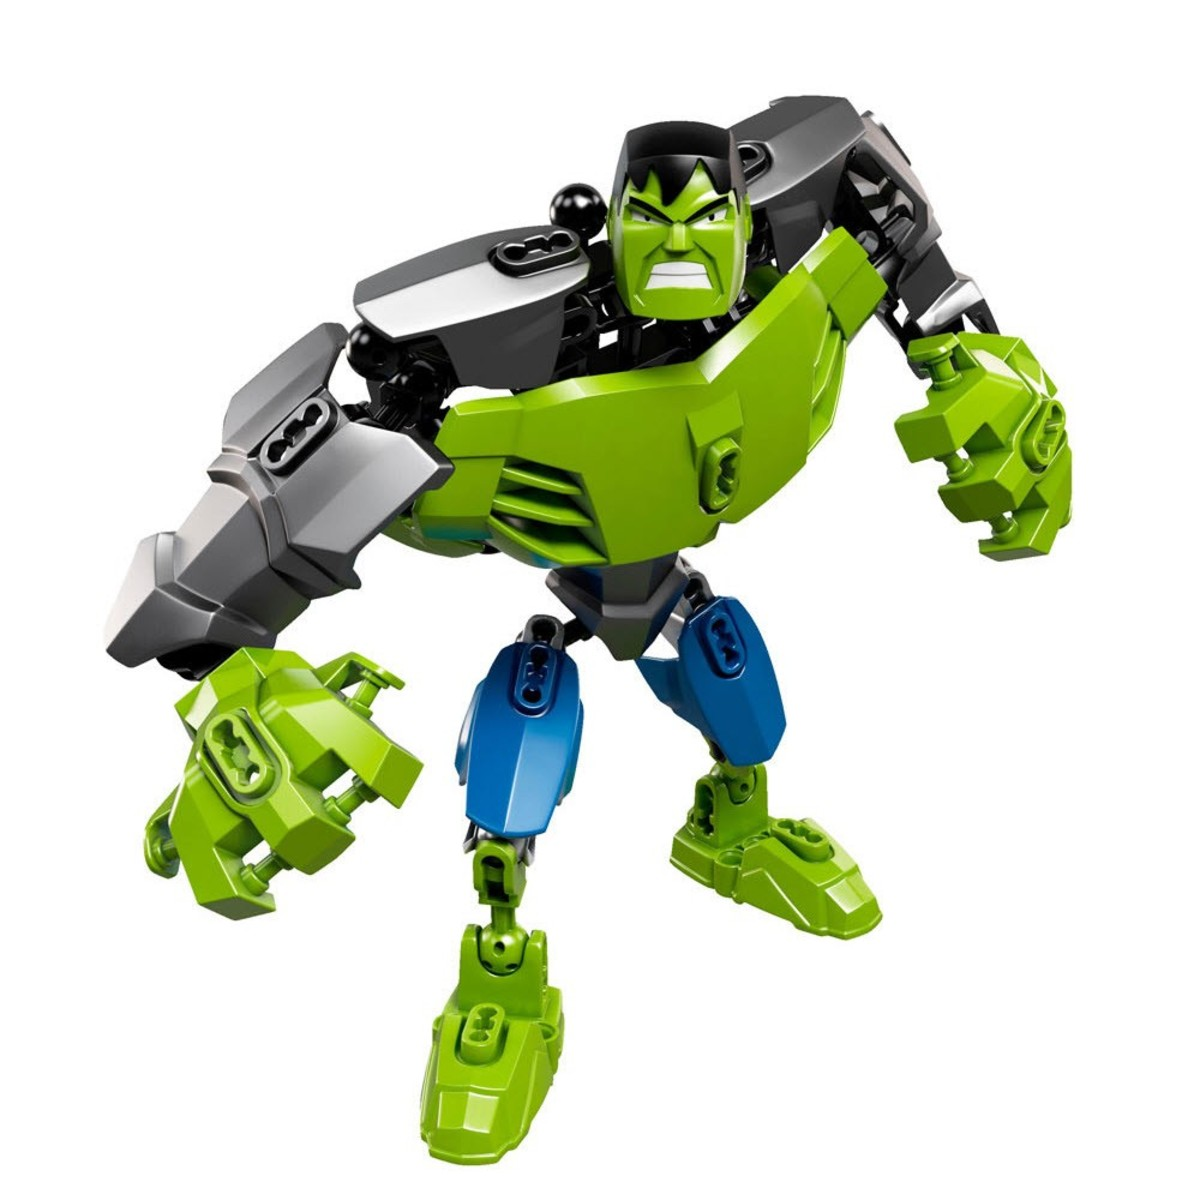 LEGO Ultrabuild Hulk 4597 Assembled